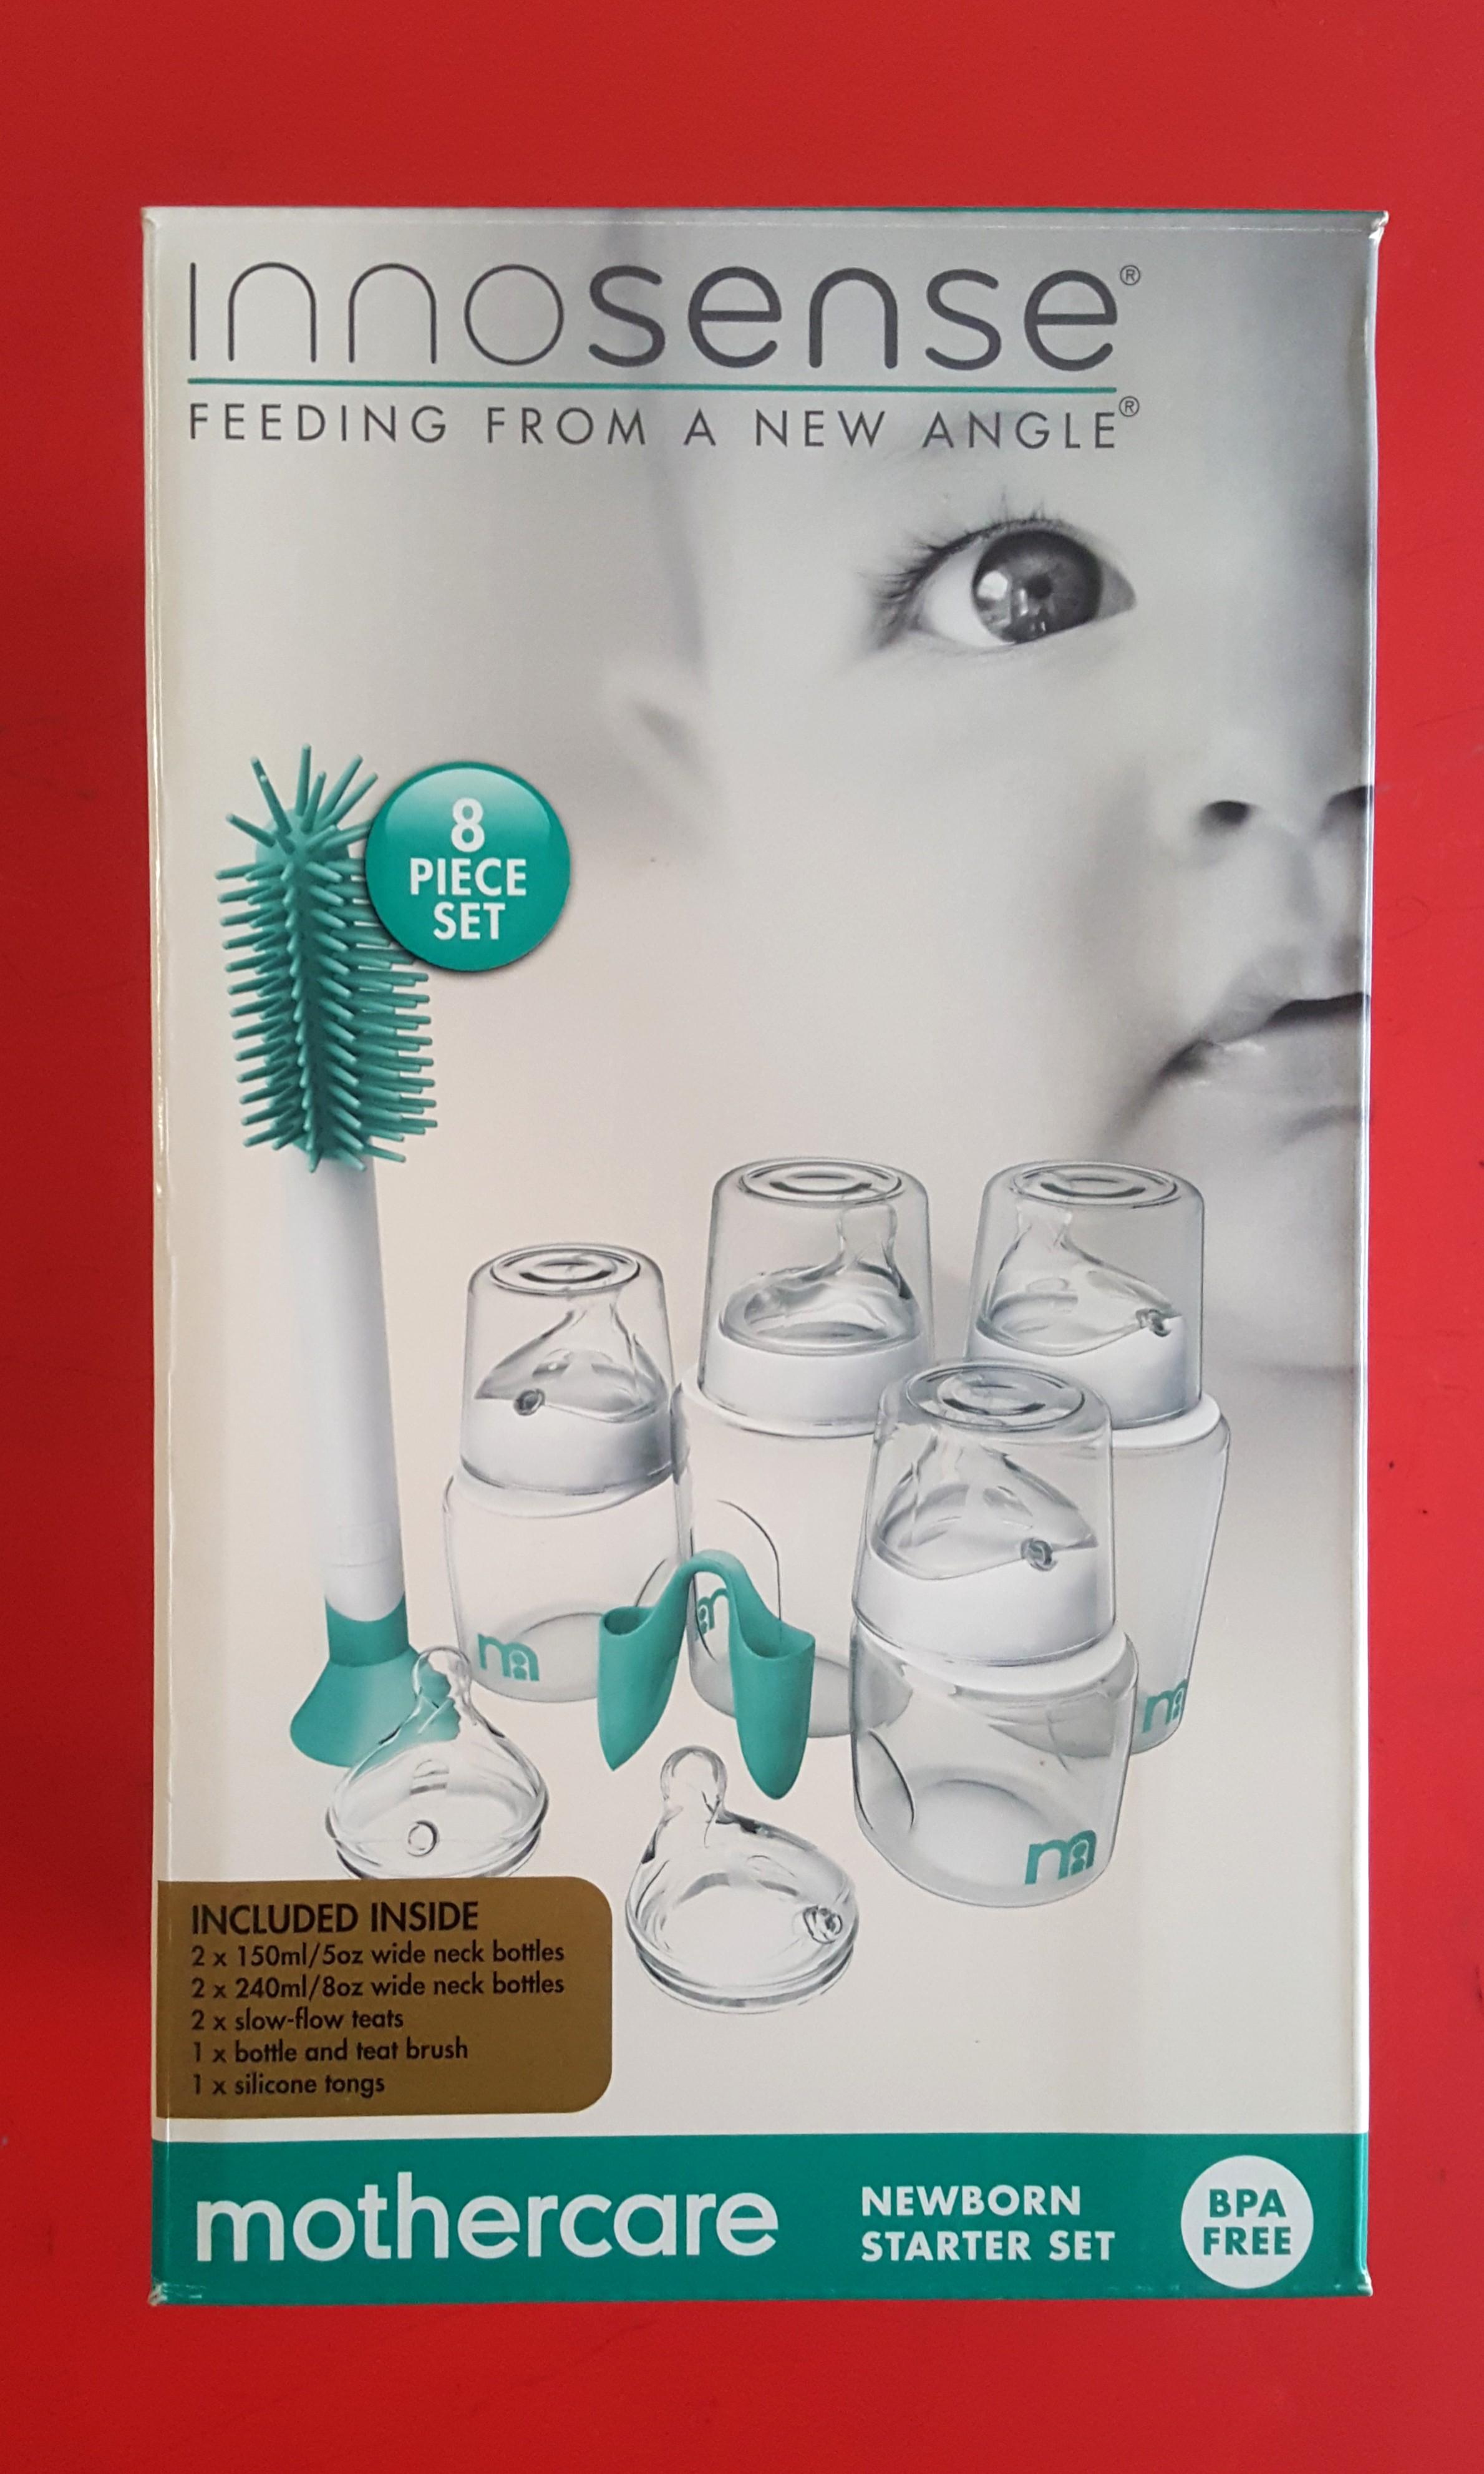 Mothercare Innosense® Newborn Starter Set (8 piece set